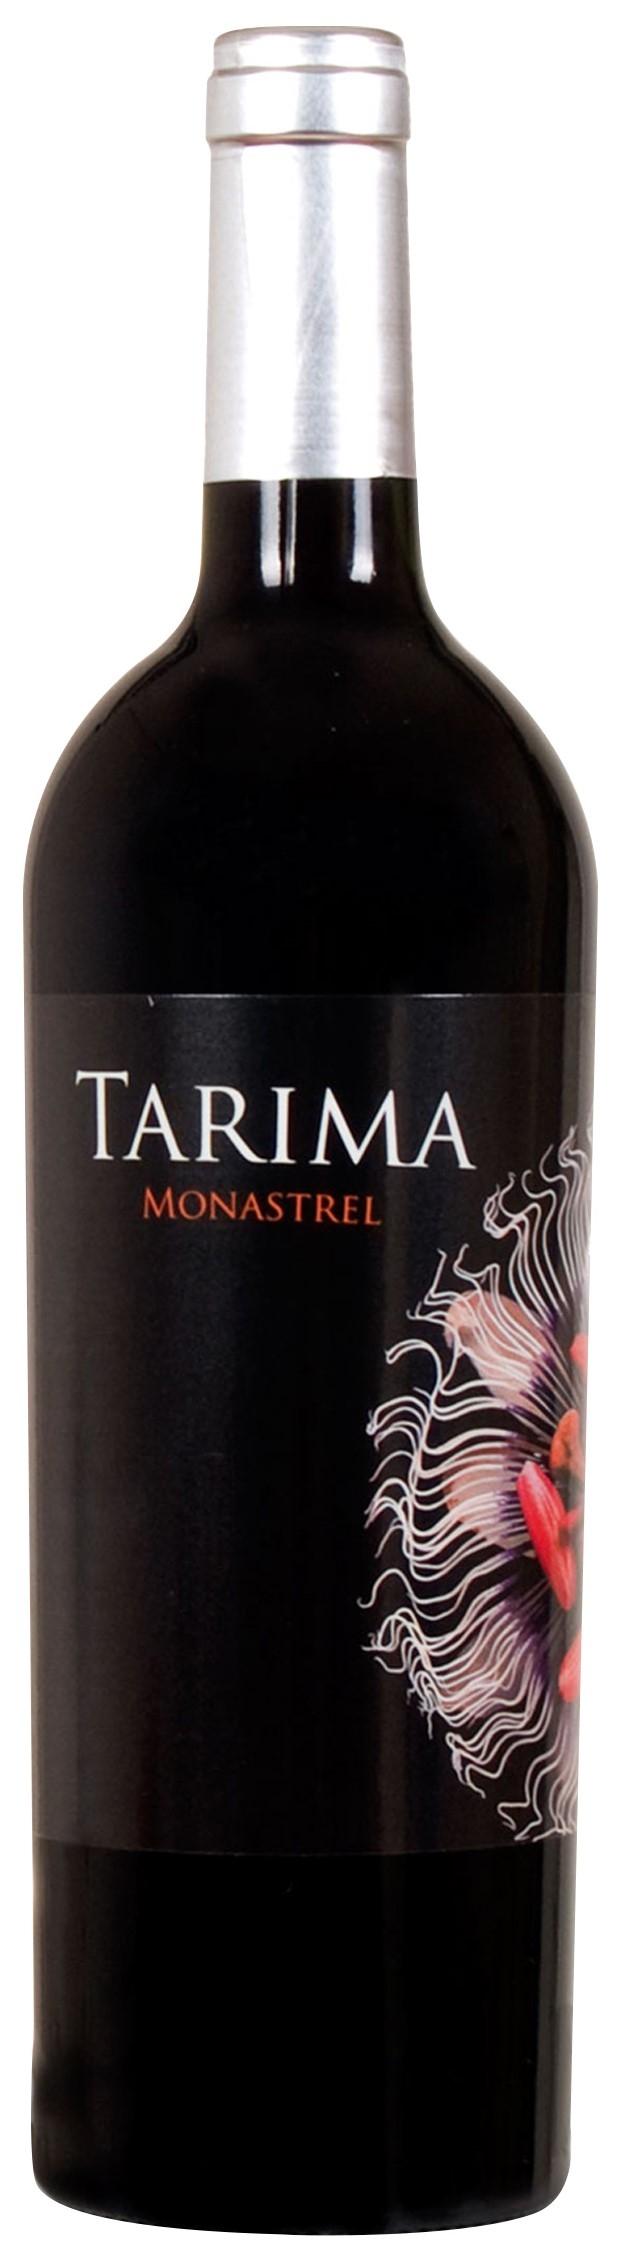 Caudalia Wine Box Bodegas Volver - Tarima - Monastrell - 2015